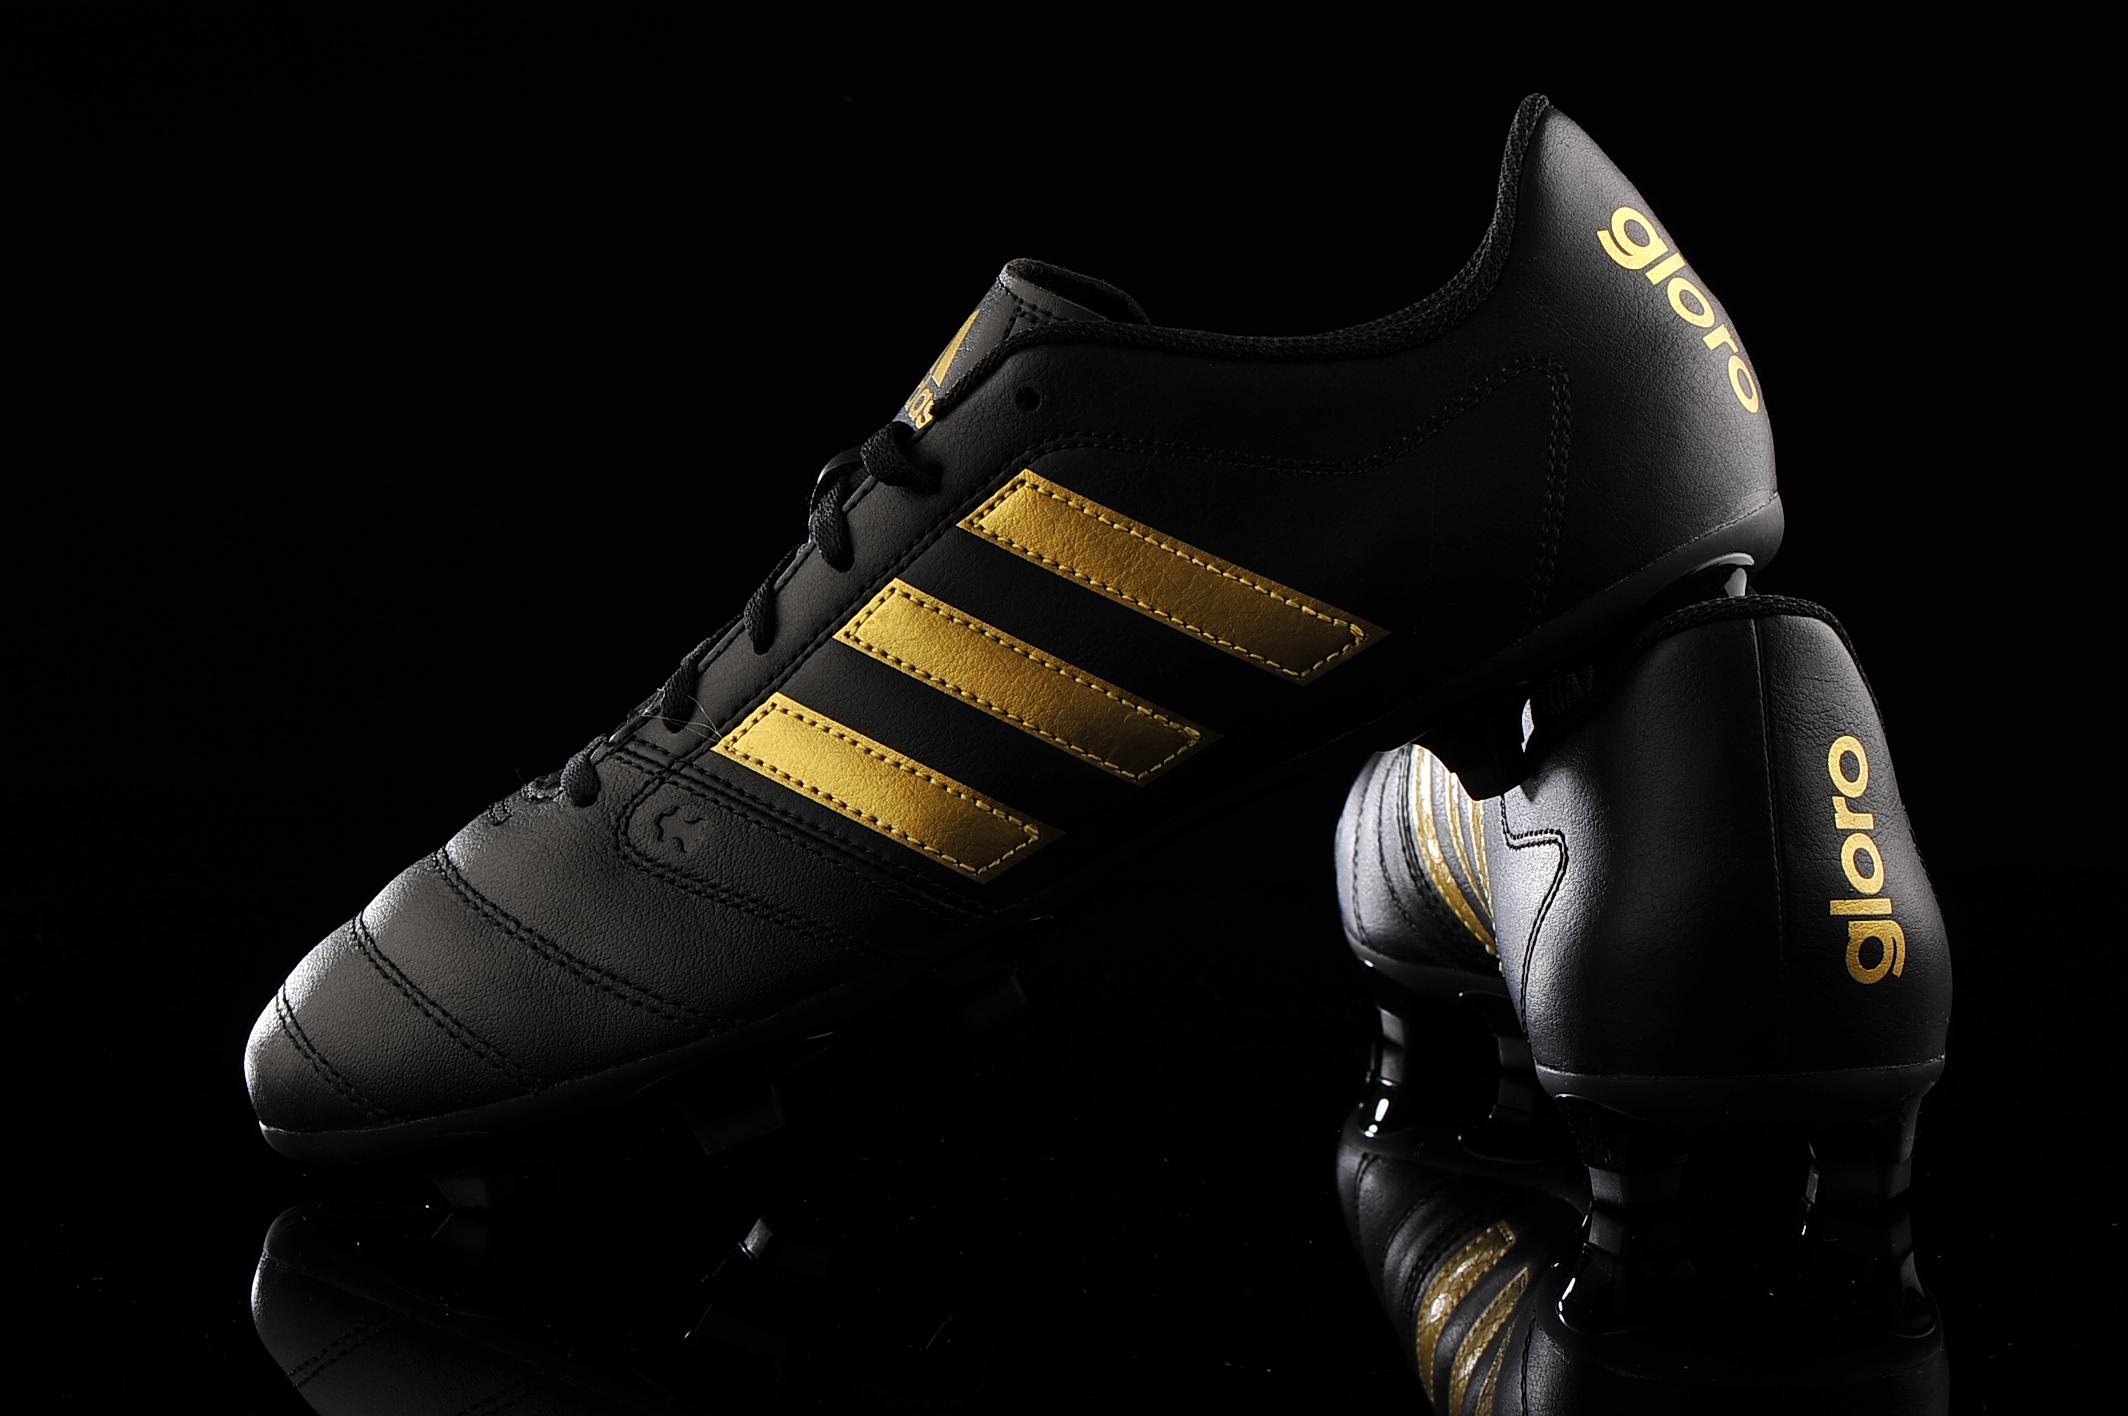 Sentimiento de culpa diapositiva Reunión  adidas Gloro 16.2 FG S42172   R-GOL.com - Football boots & equipment